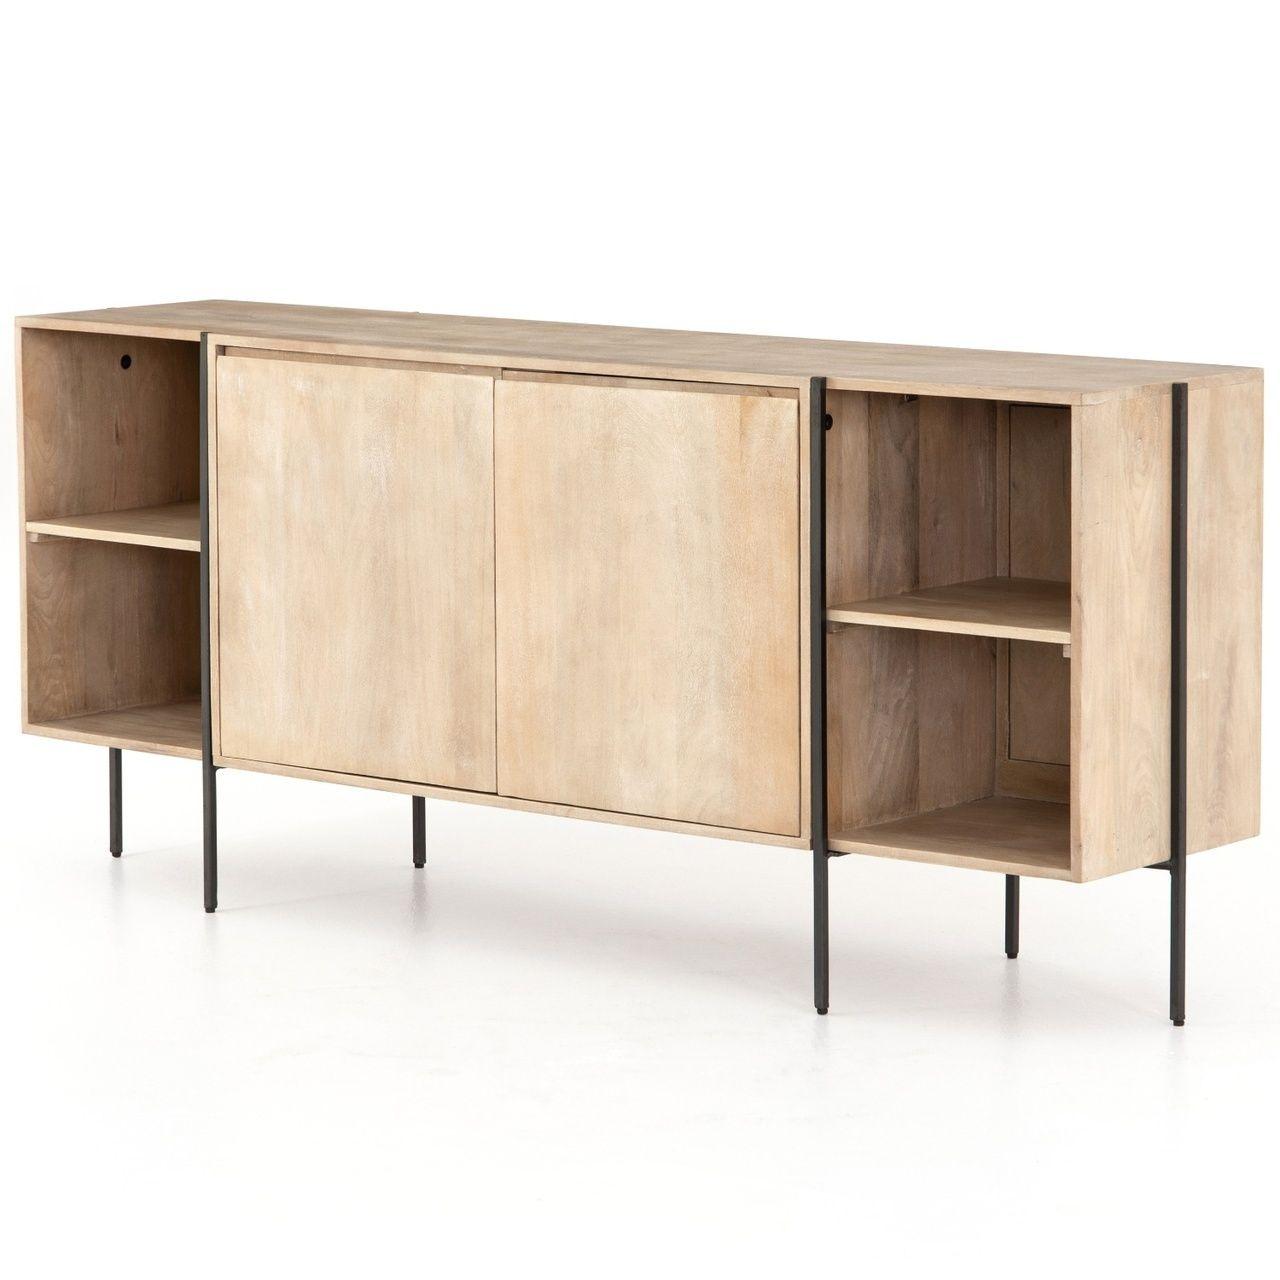 coastal industrial buffet sideboard 73 in 2019 storage cabinets rh pinterest com